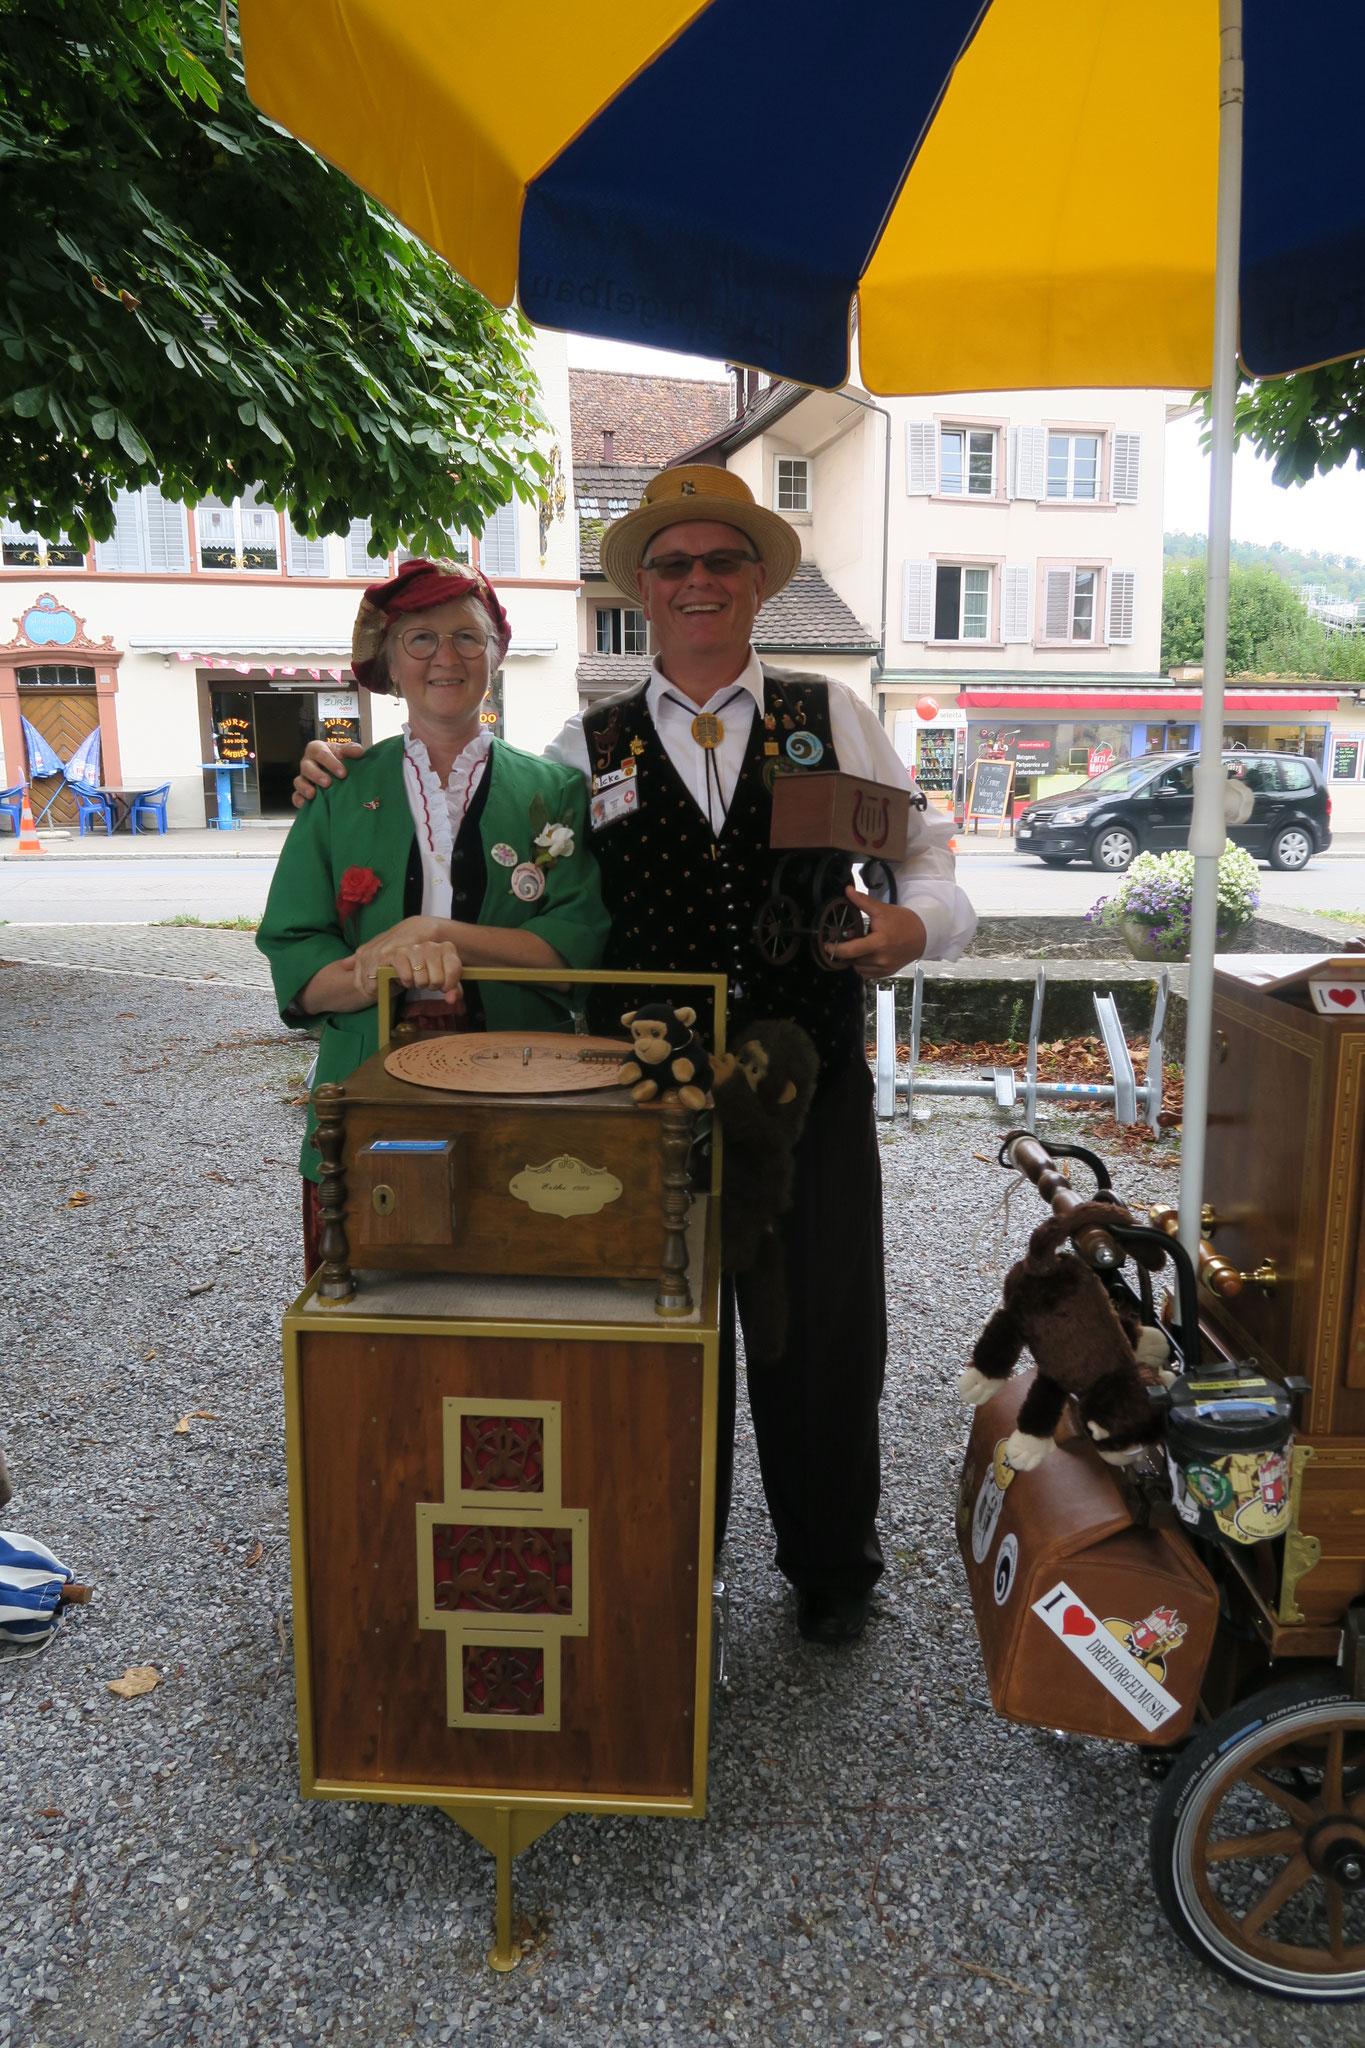 Esthi und Dani Widmer aus Basel